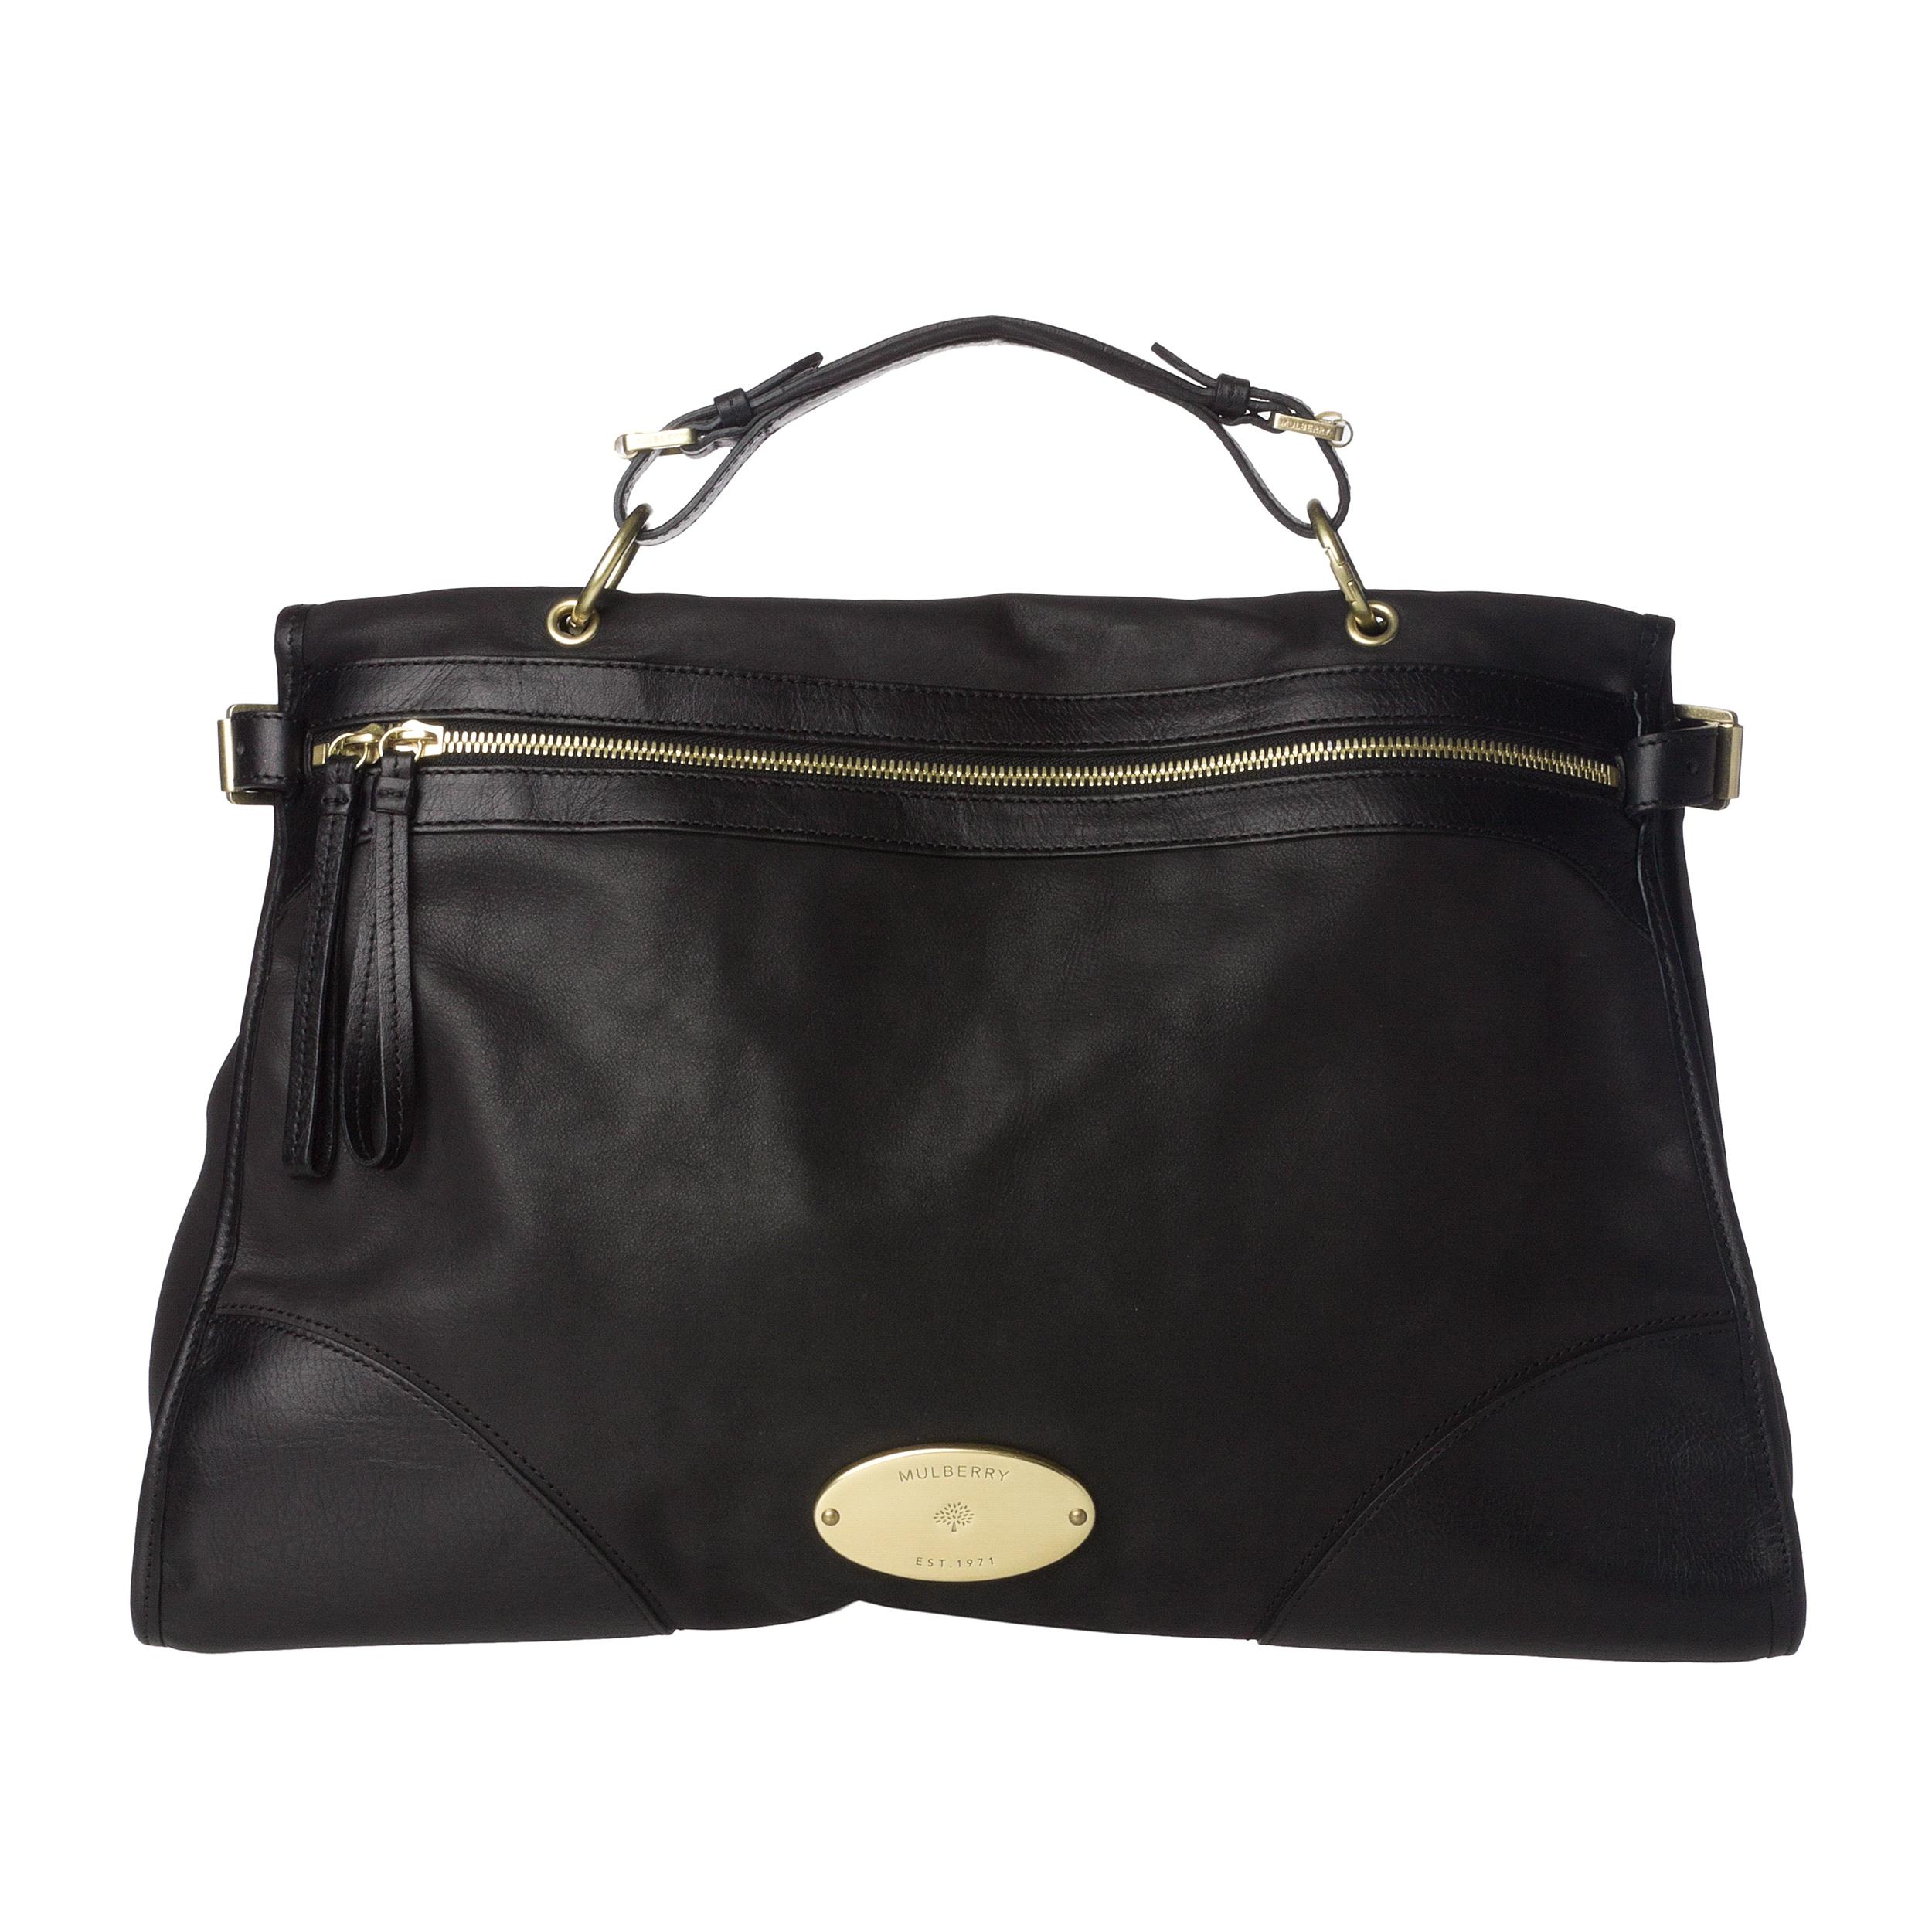 Mulberry 'Taylor' Oversized Black Leather Satchel